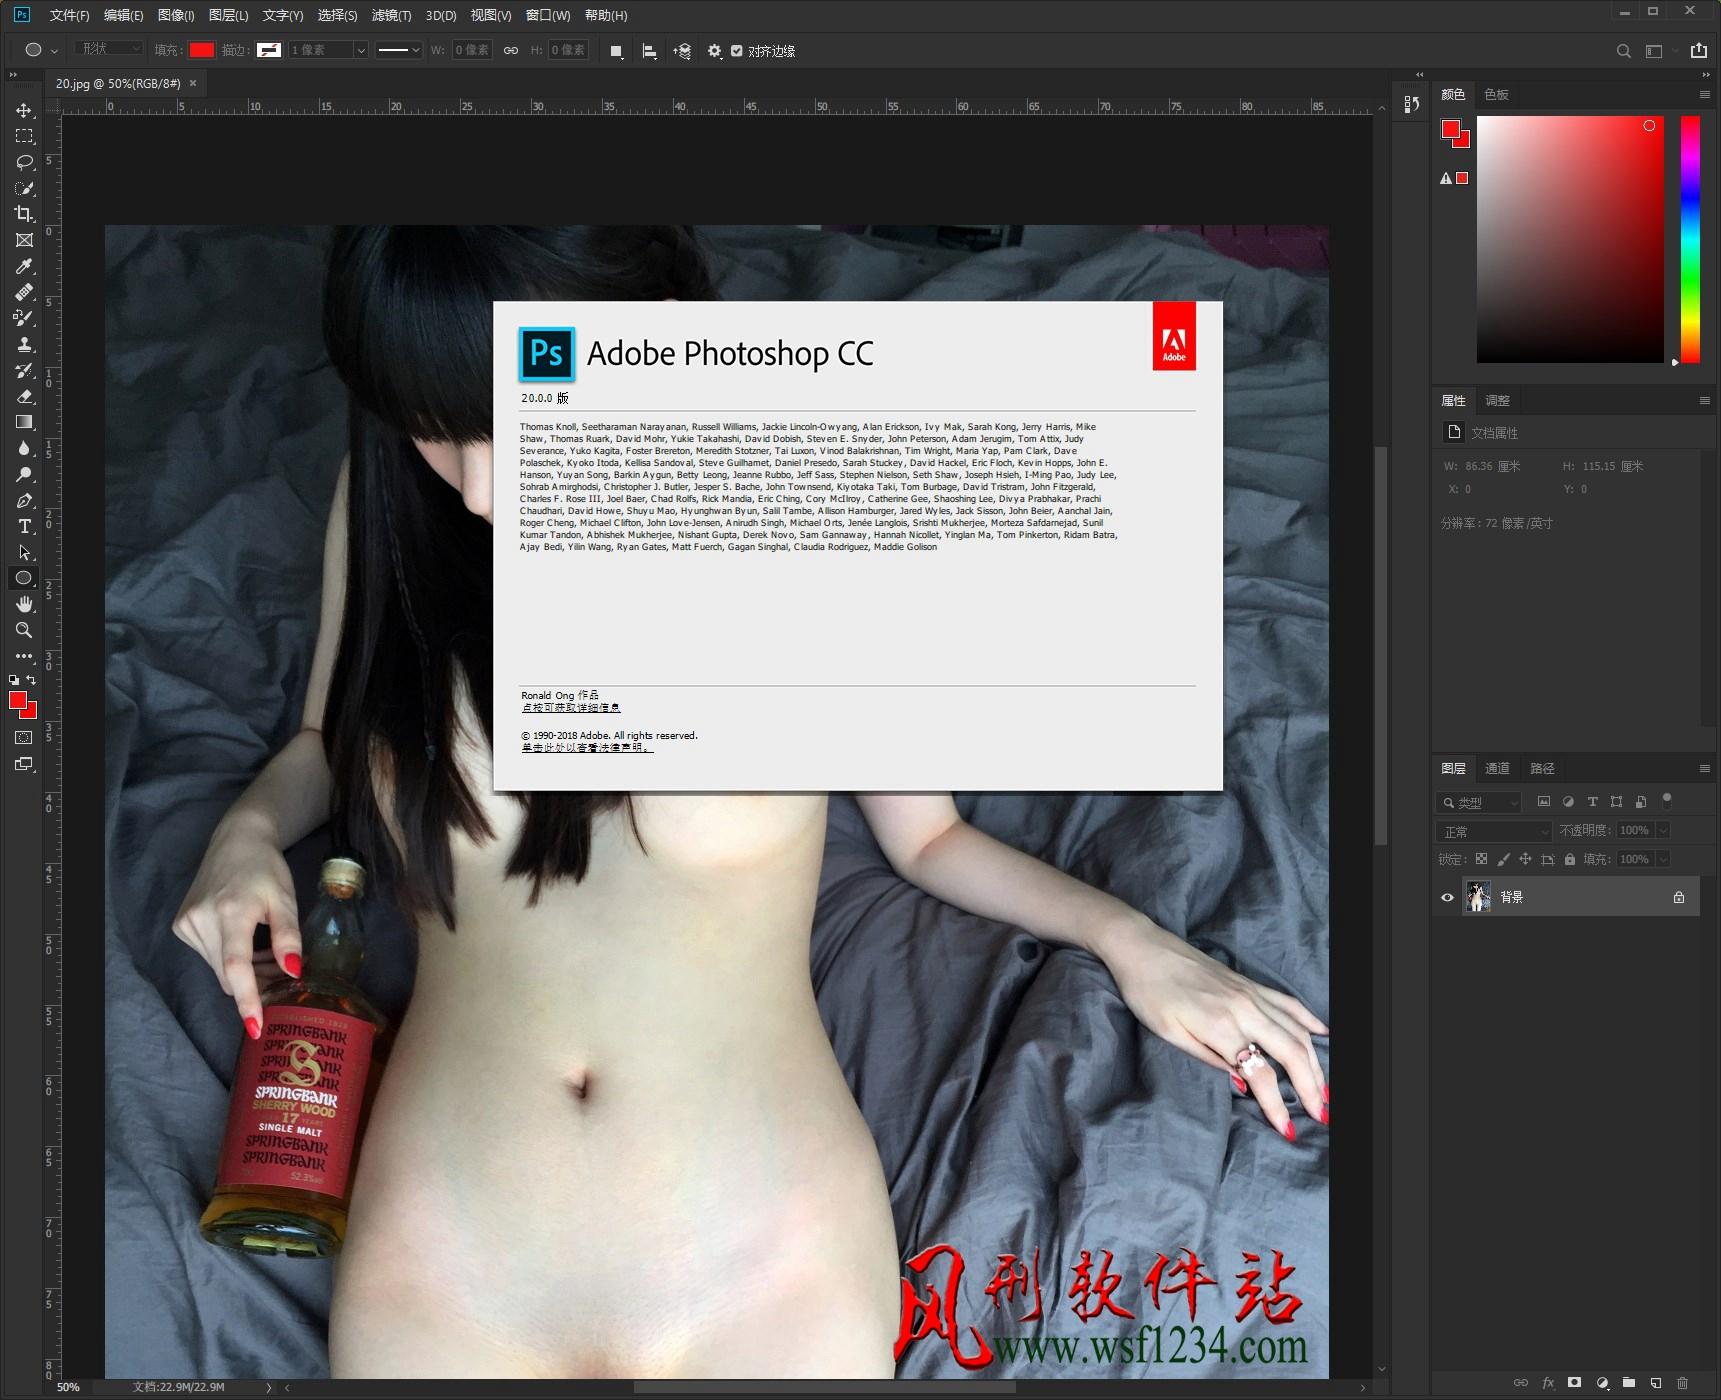 Adobe Photoshop CC 2019 20.0.3.24950 64位简体中文破解版-风刑软件站